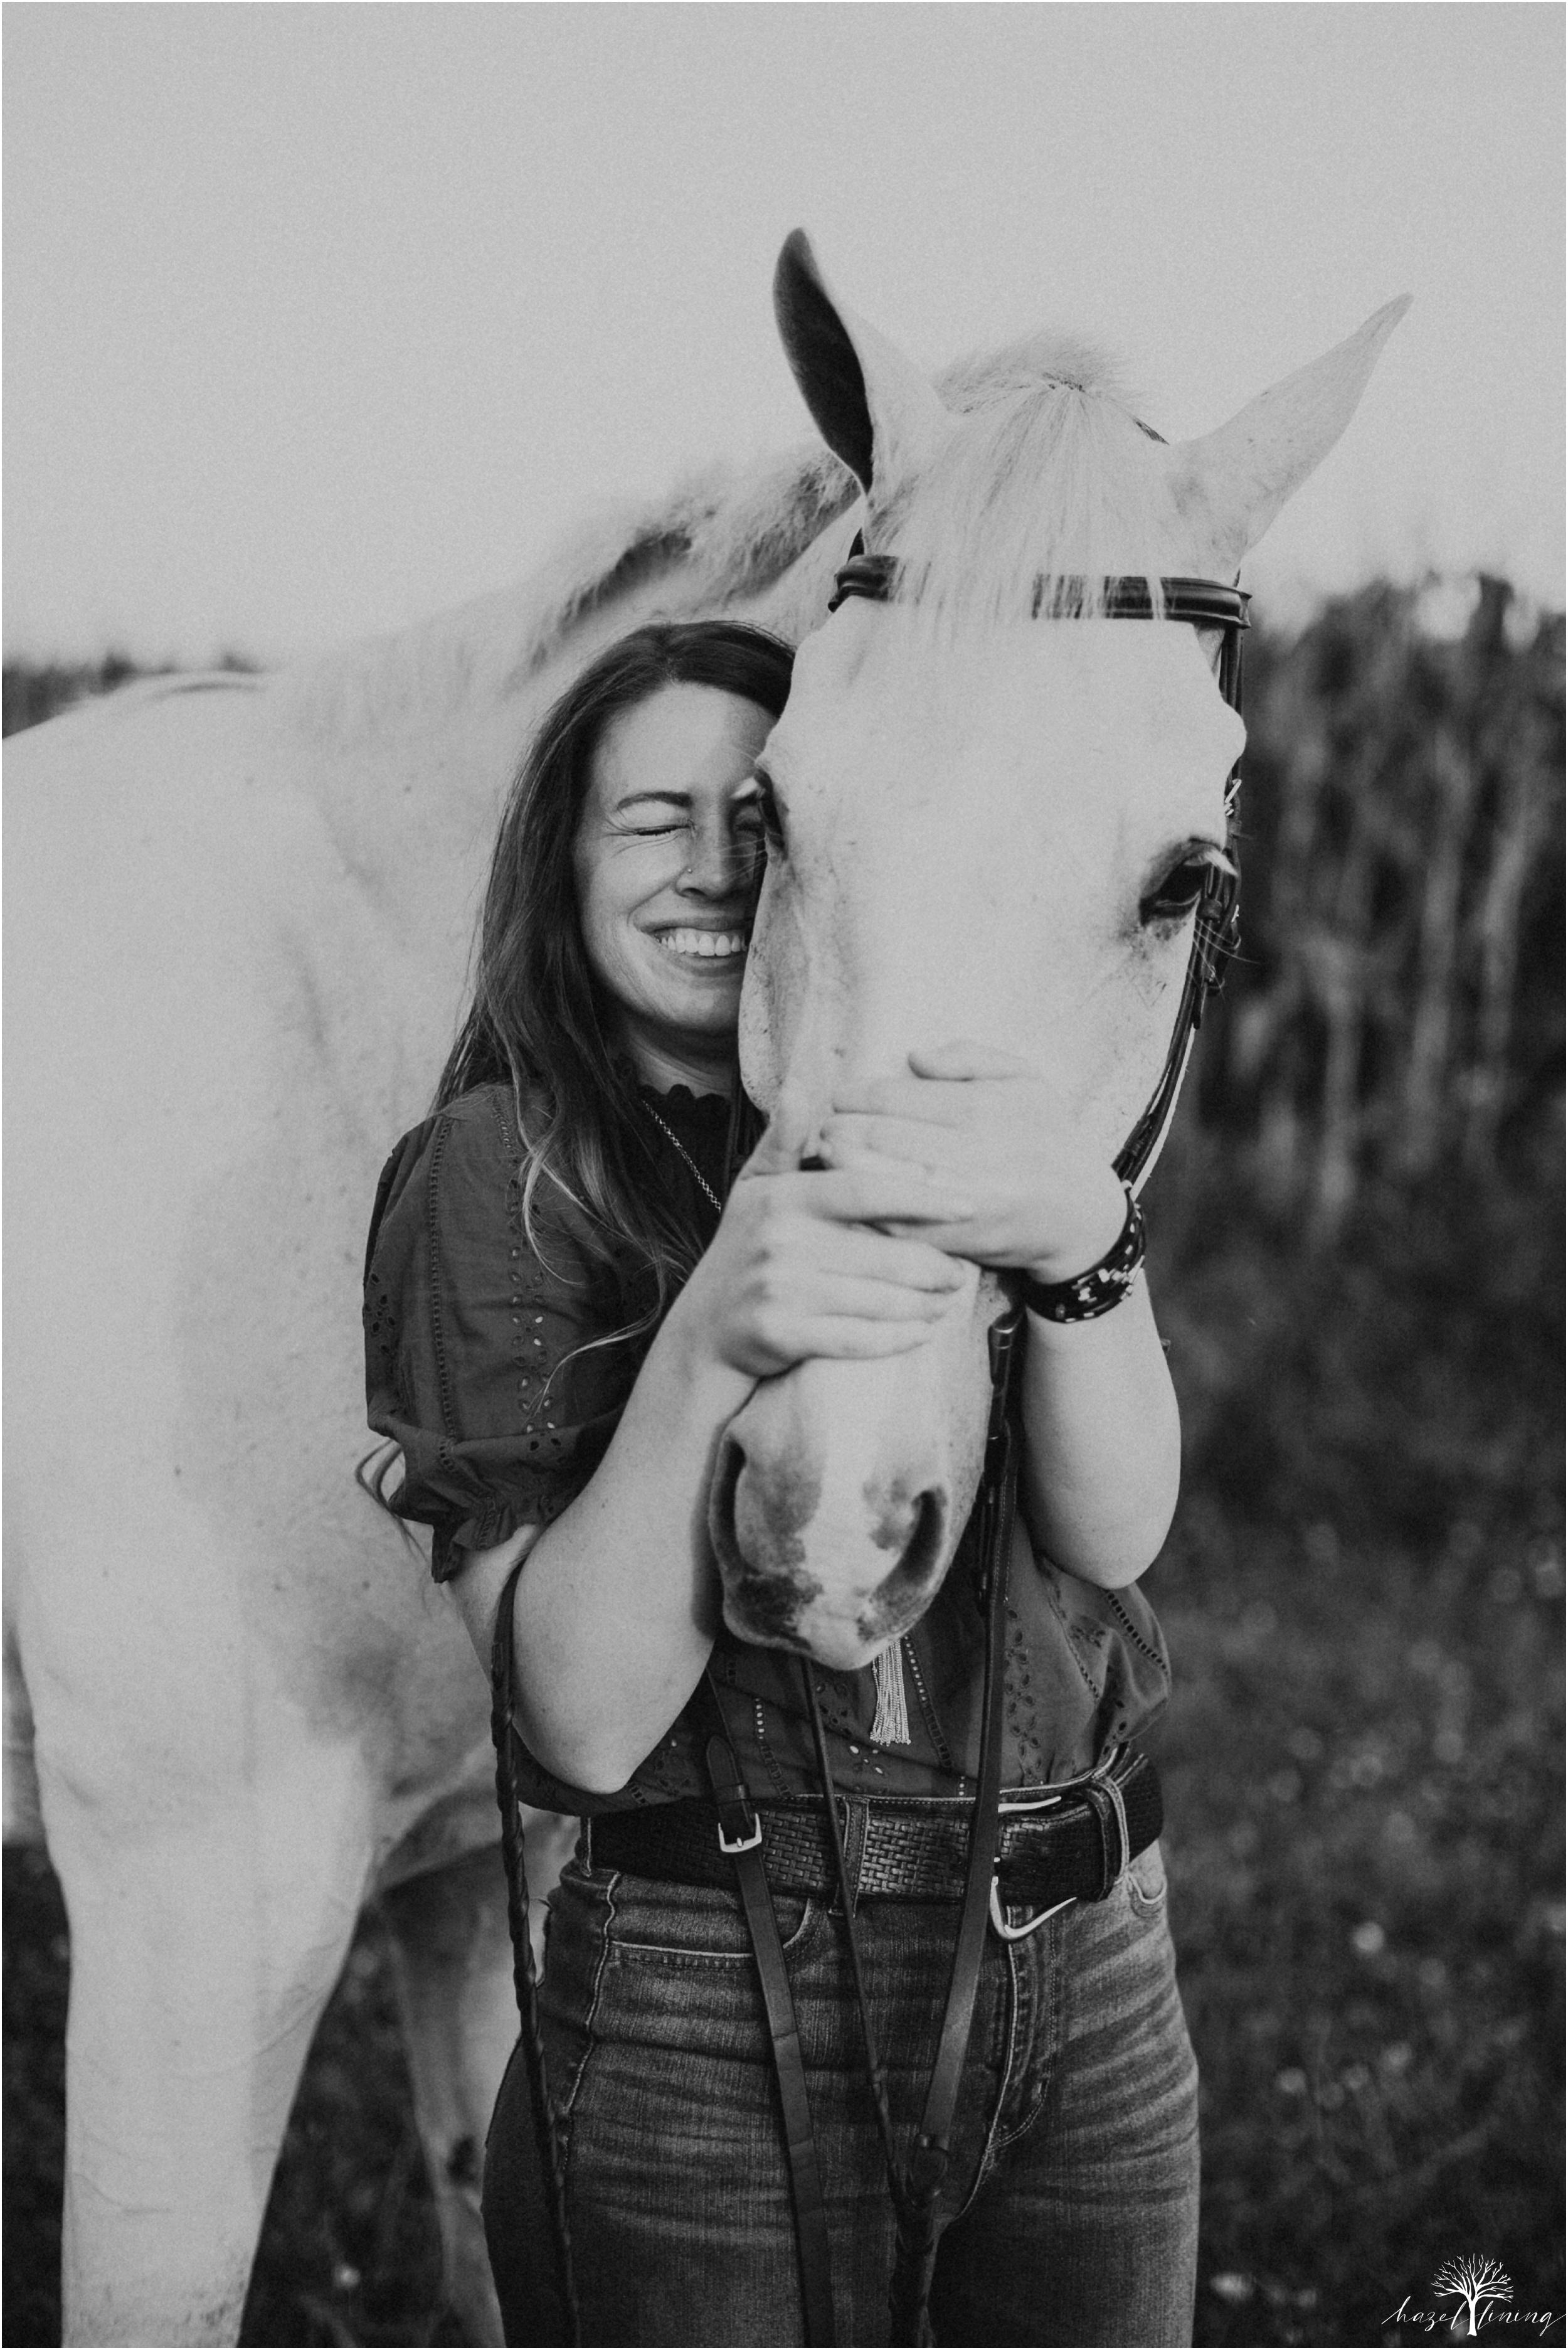 taylor-adams-and-horse-delaware-valley-university-delval-summer-equestrian-portrait-session-hazel-lining-photography-destination-elopement-wedding-engagement-photography_0025.jpg